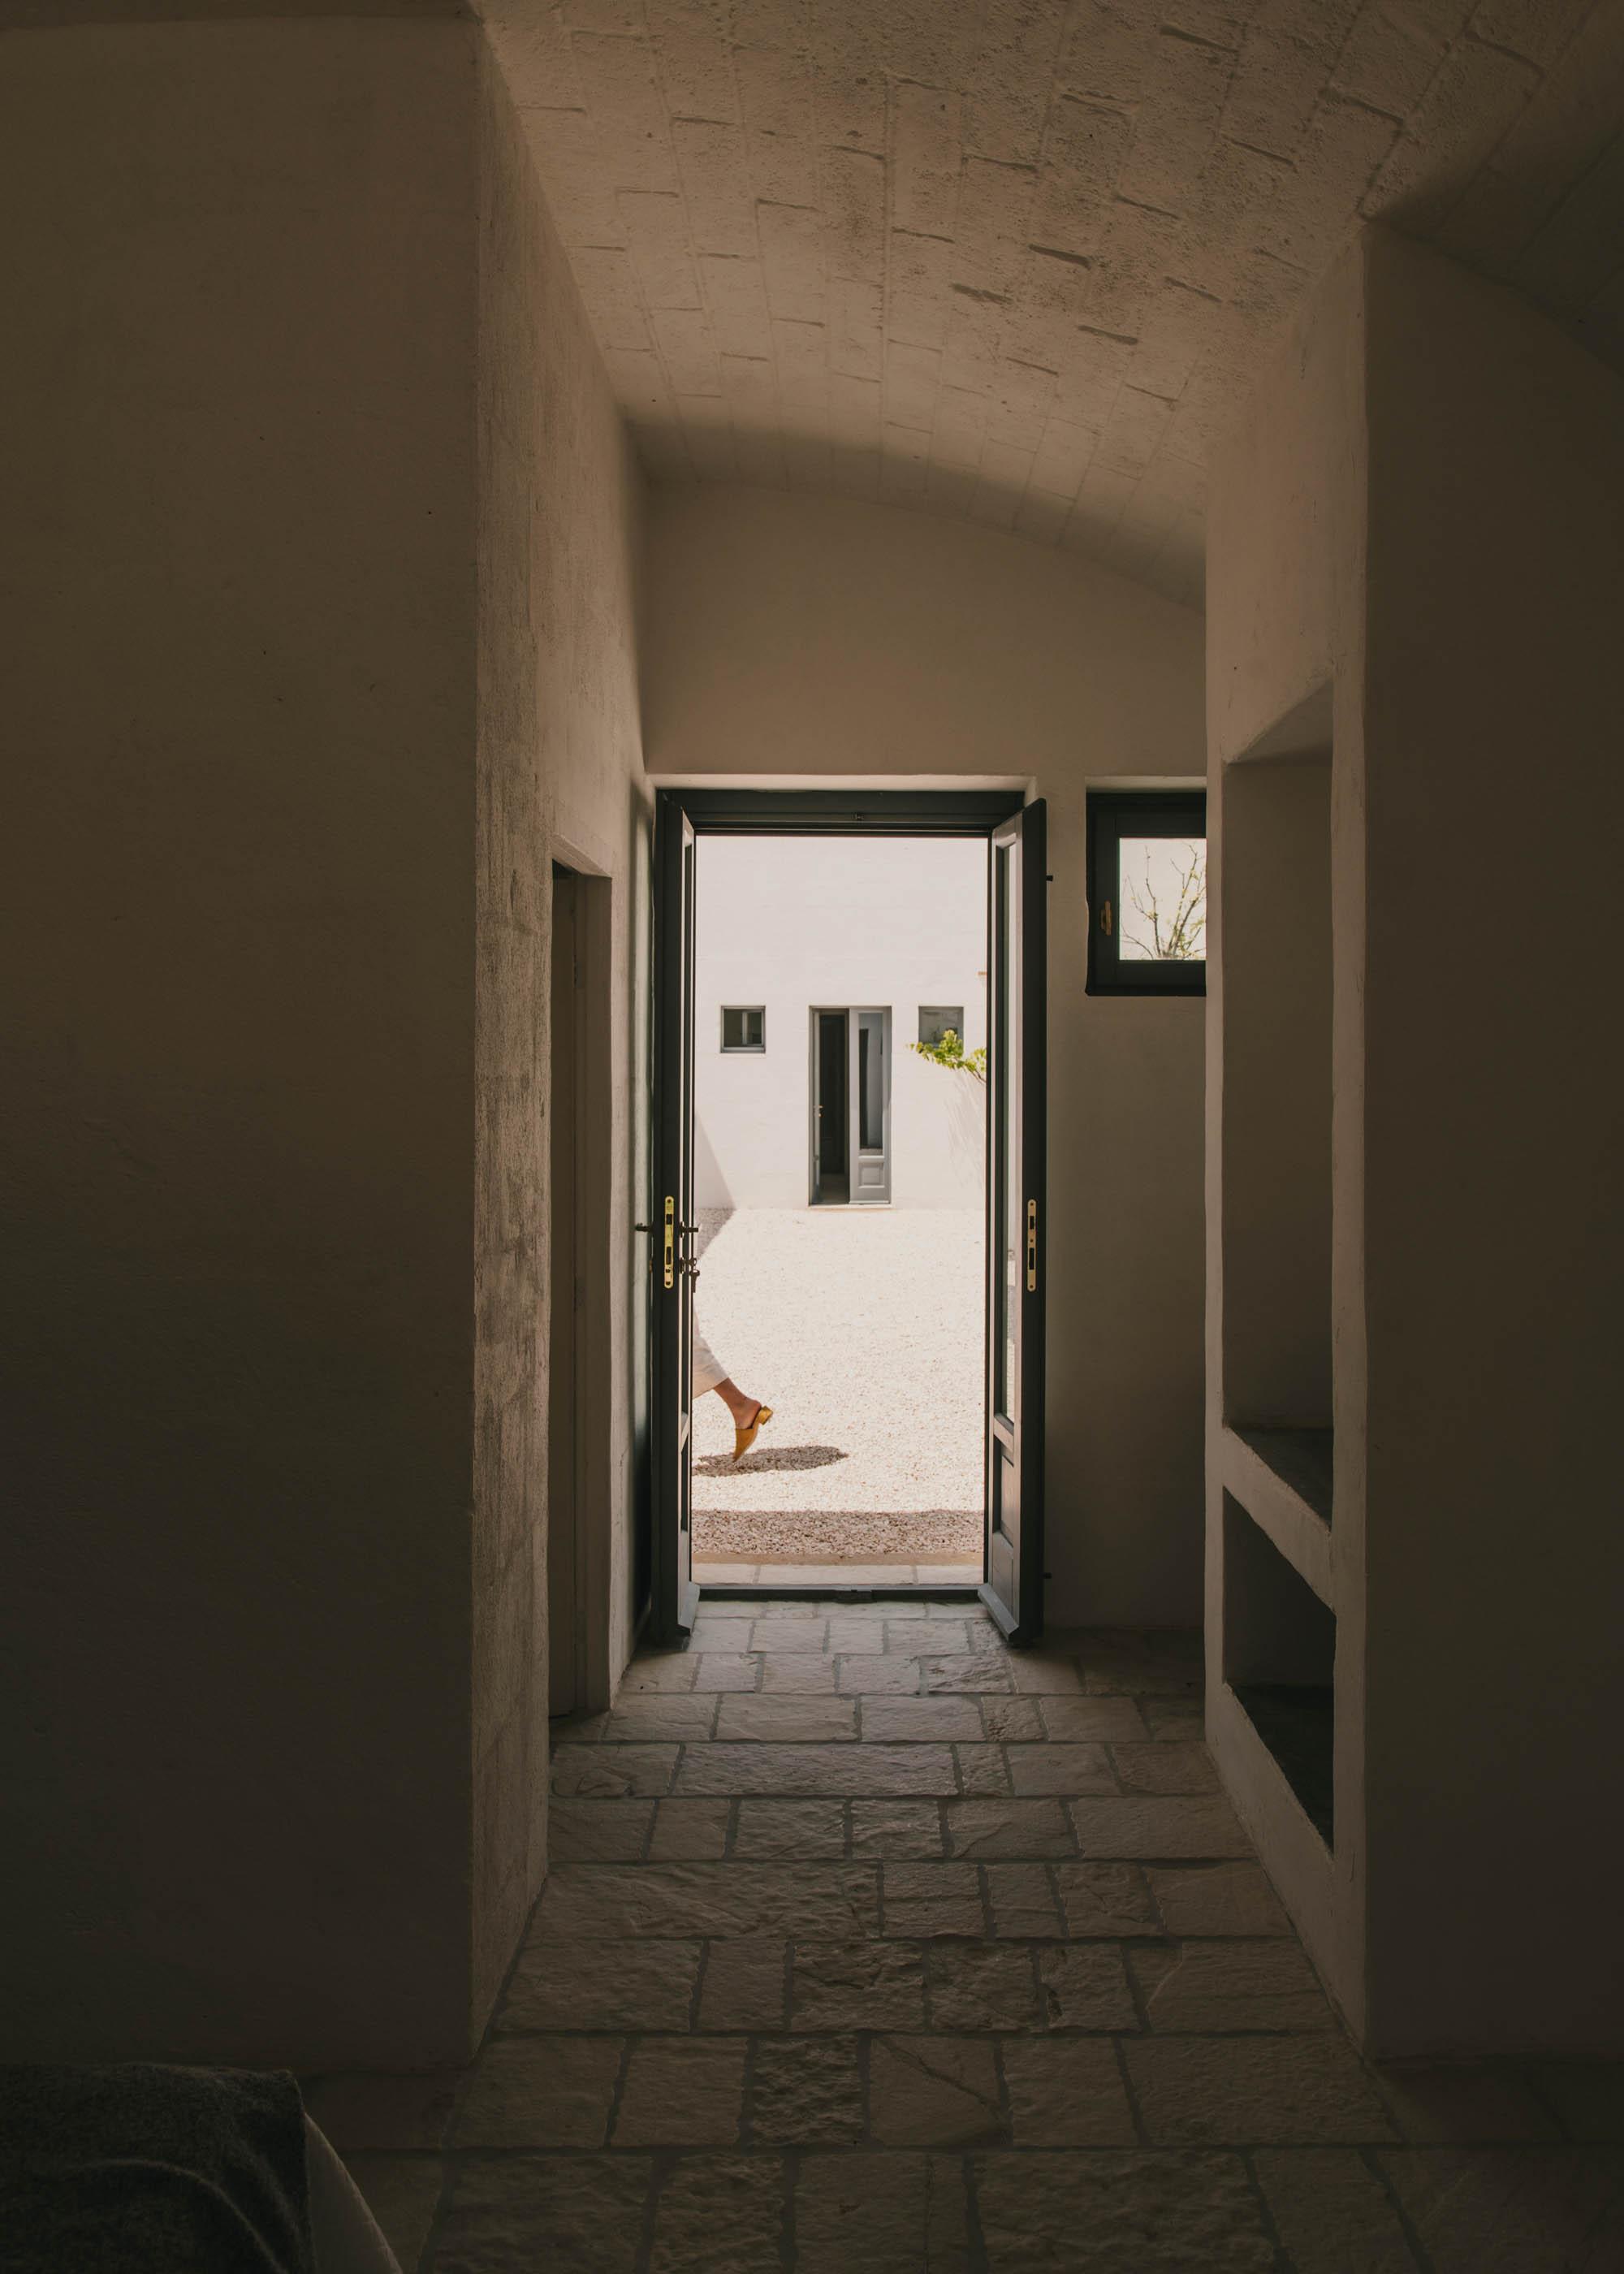 #italy #puglia #interiors #masseria #morosseta #openhouse #hotels